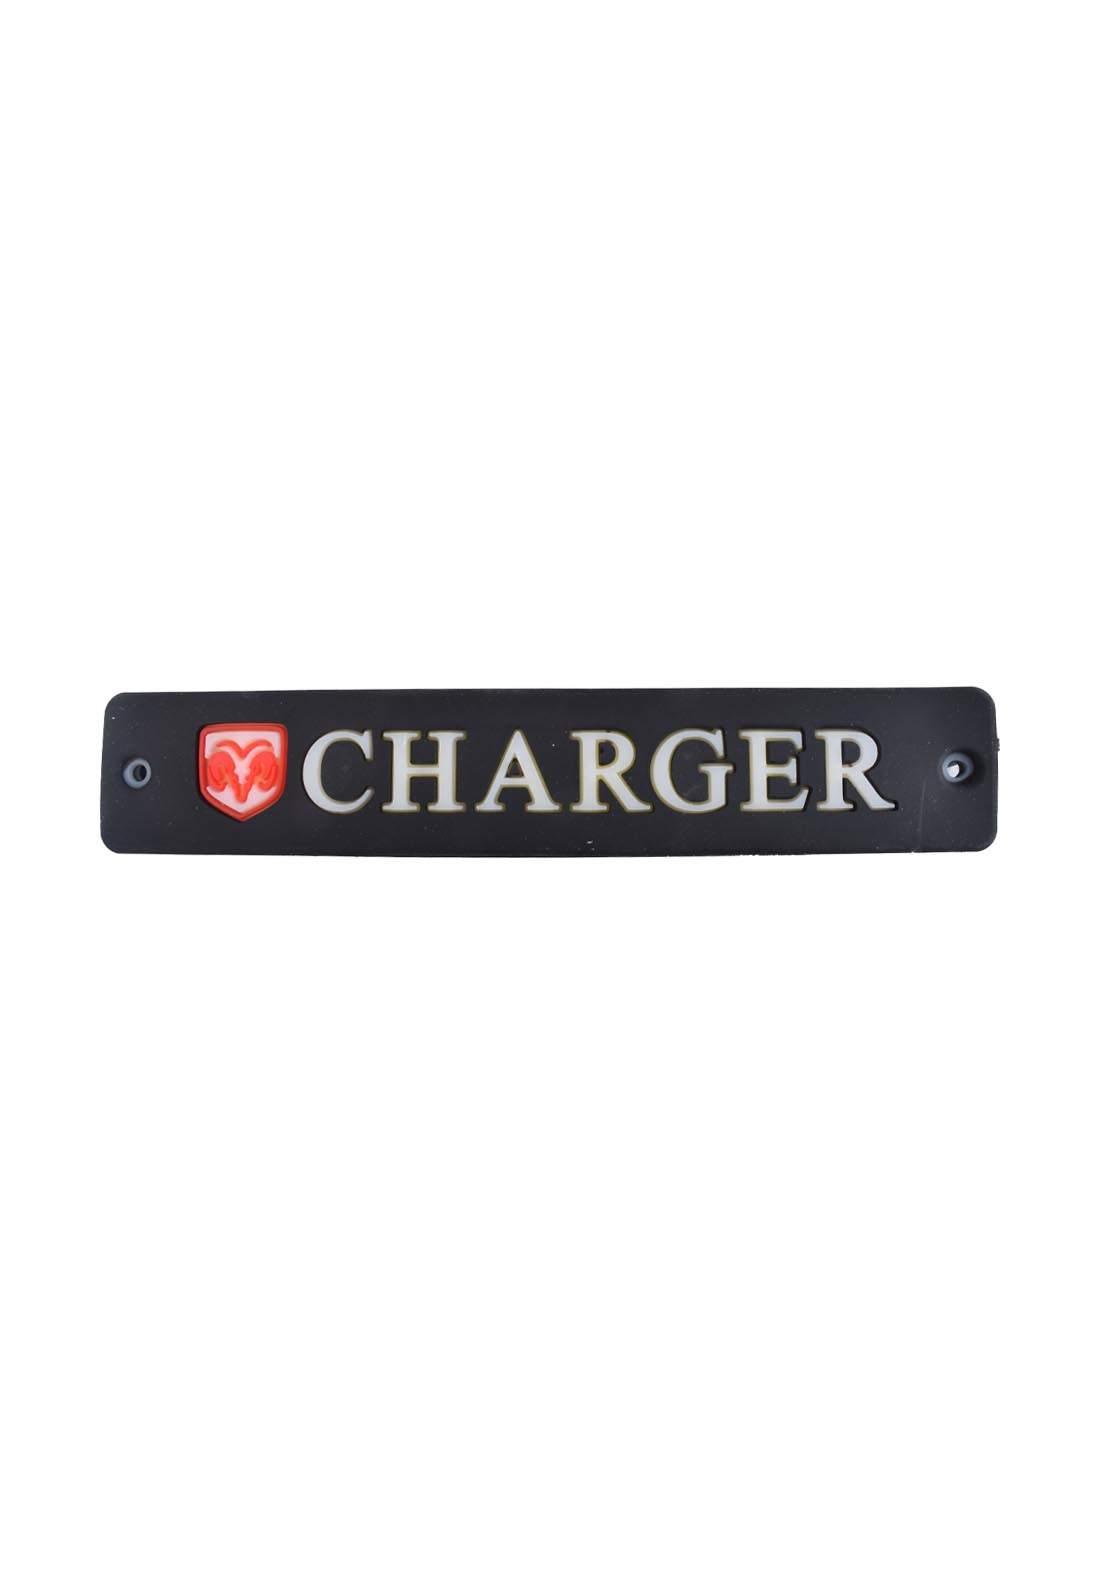 Led Daytime Running Lights -CHARGER علامة ضوئية للسيارة